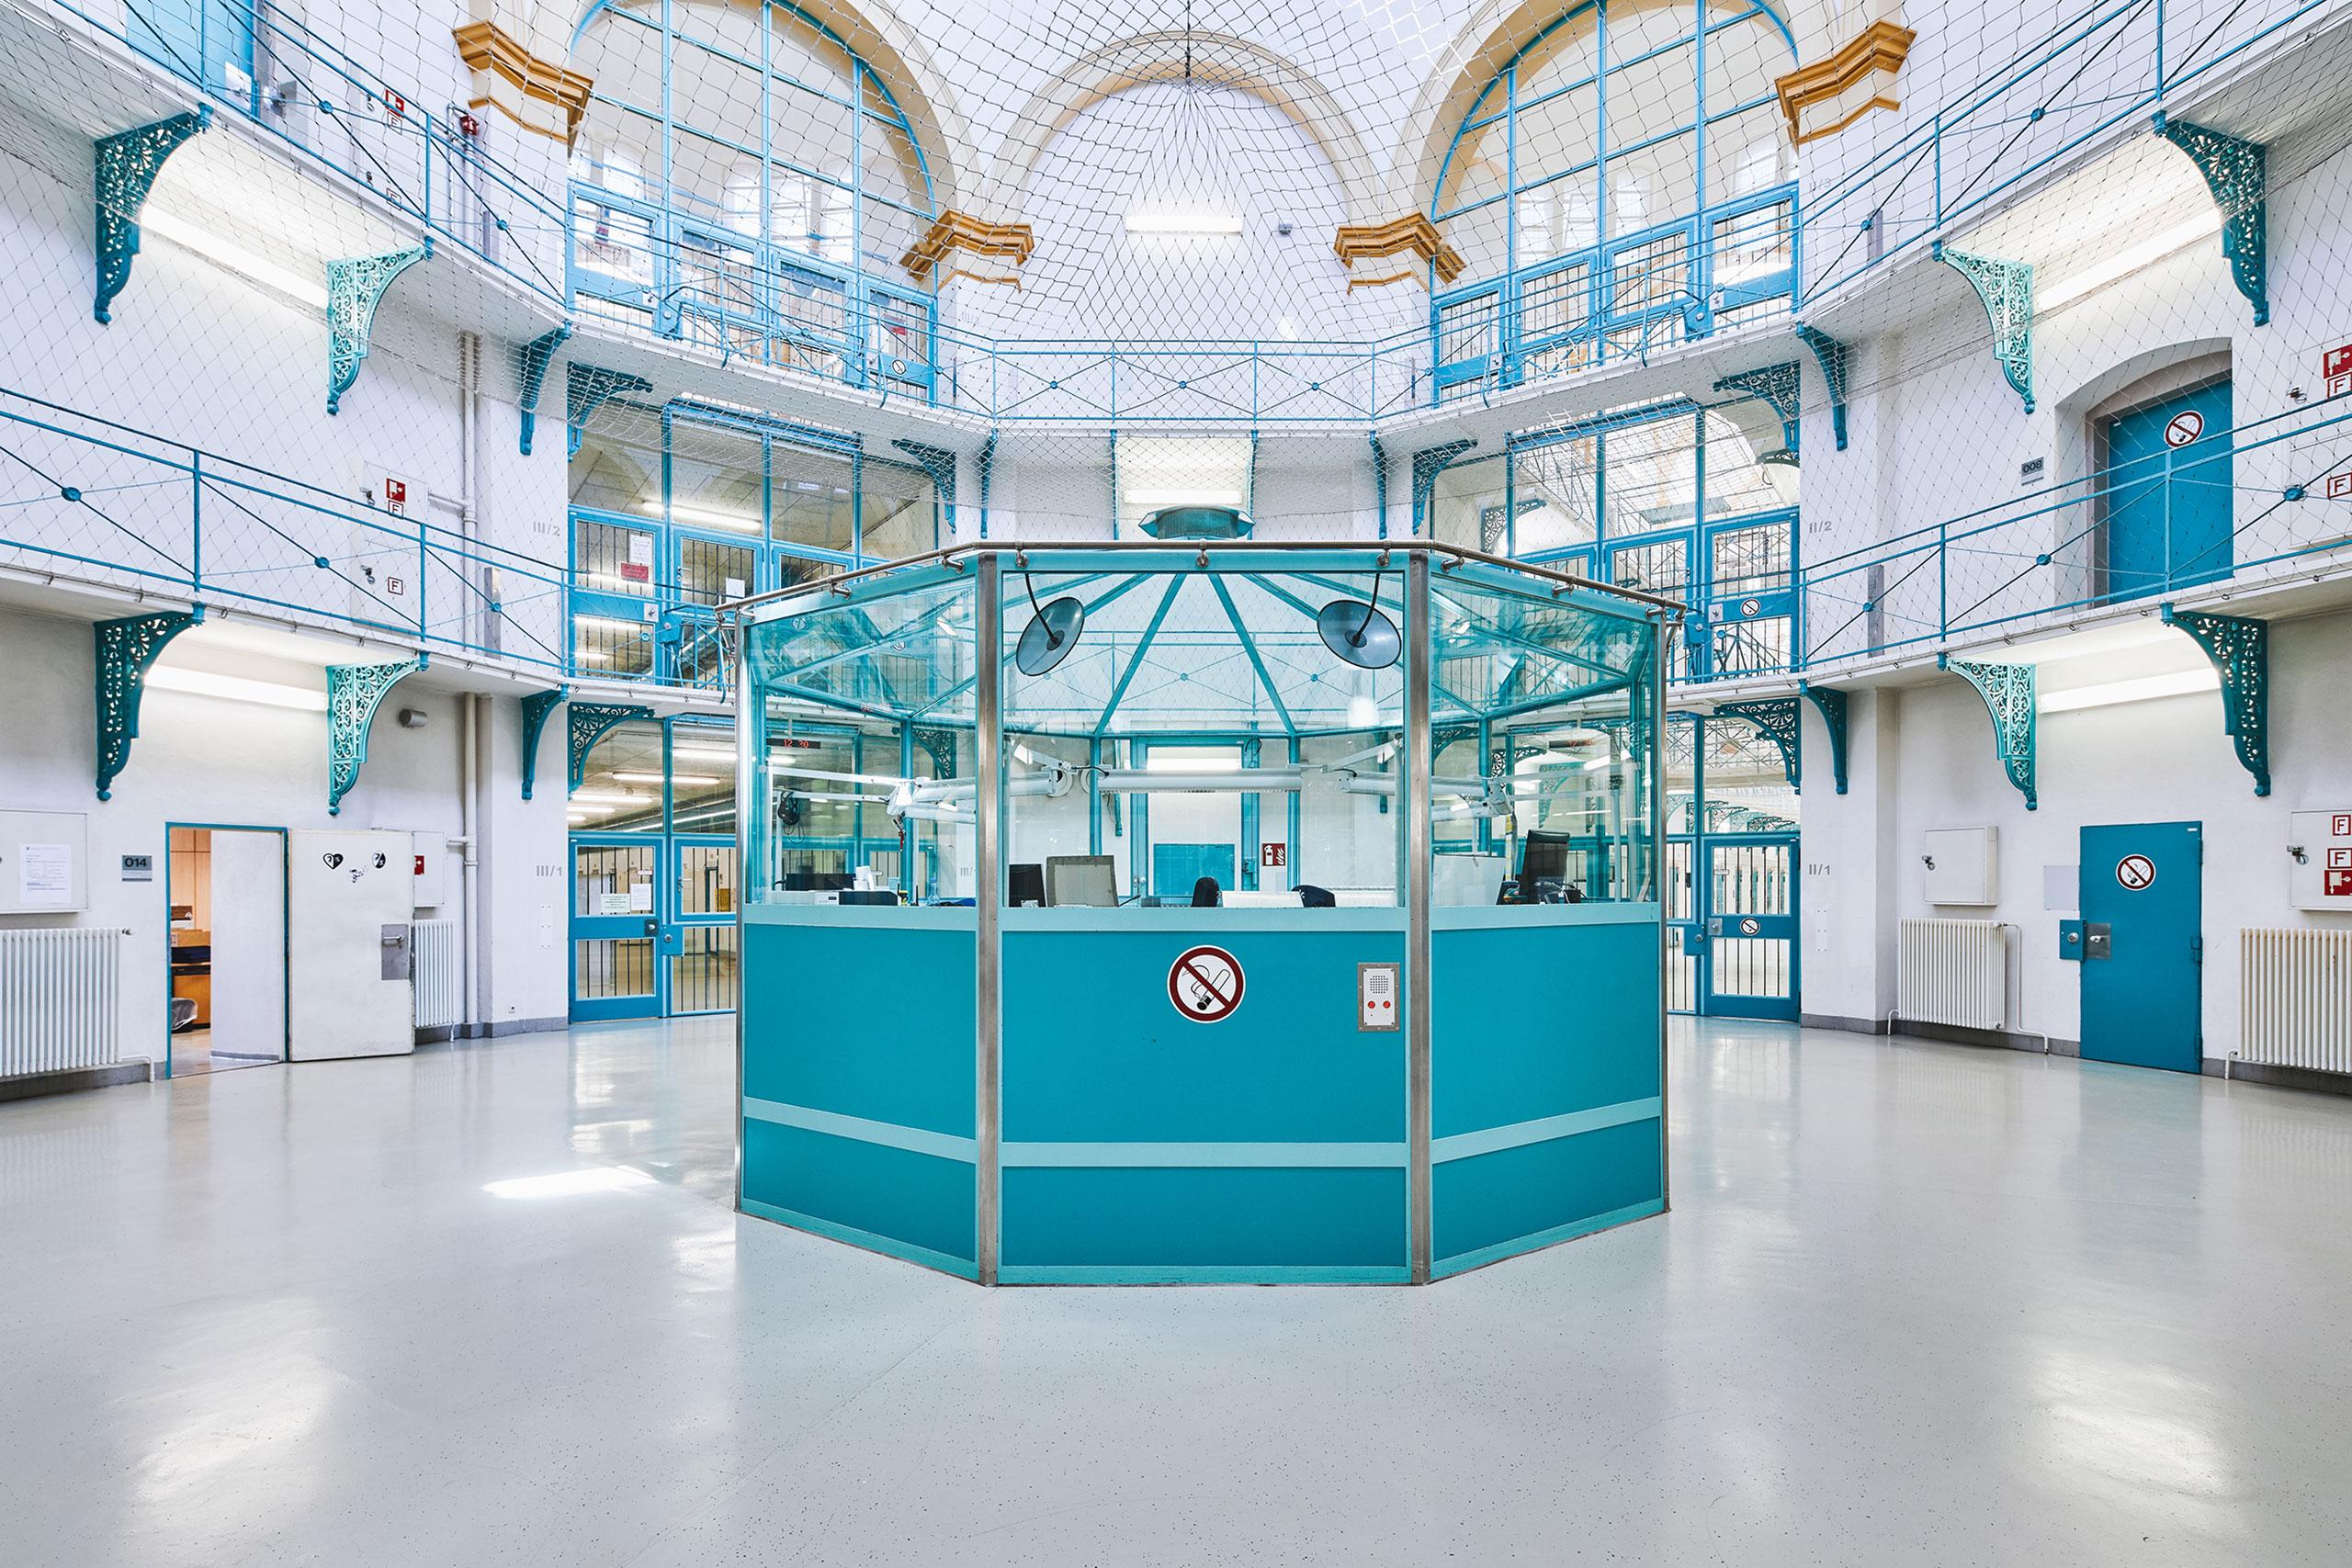 Geman Prisons JVA Series by David Altrath